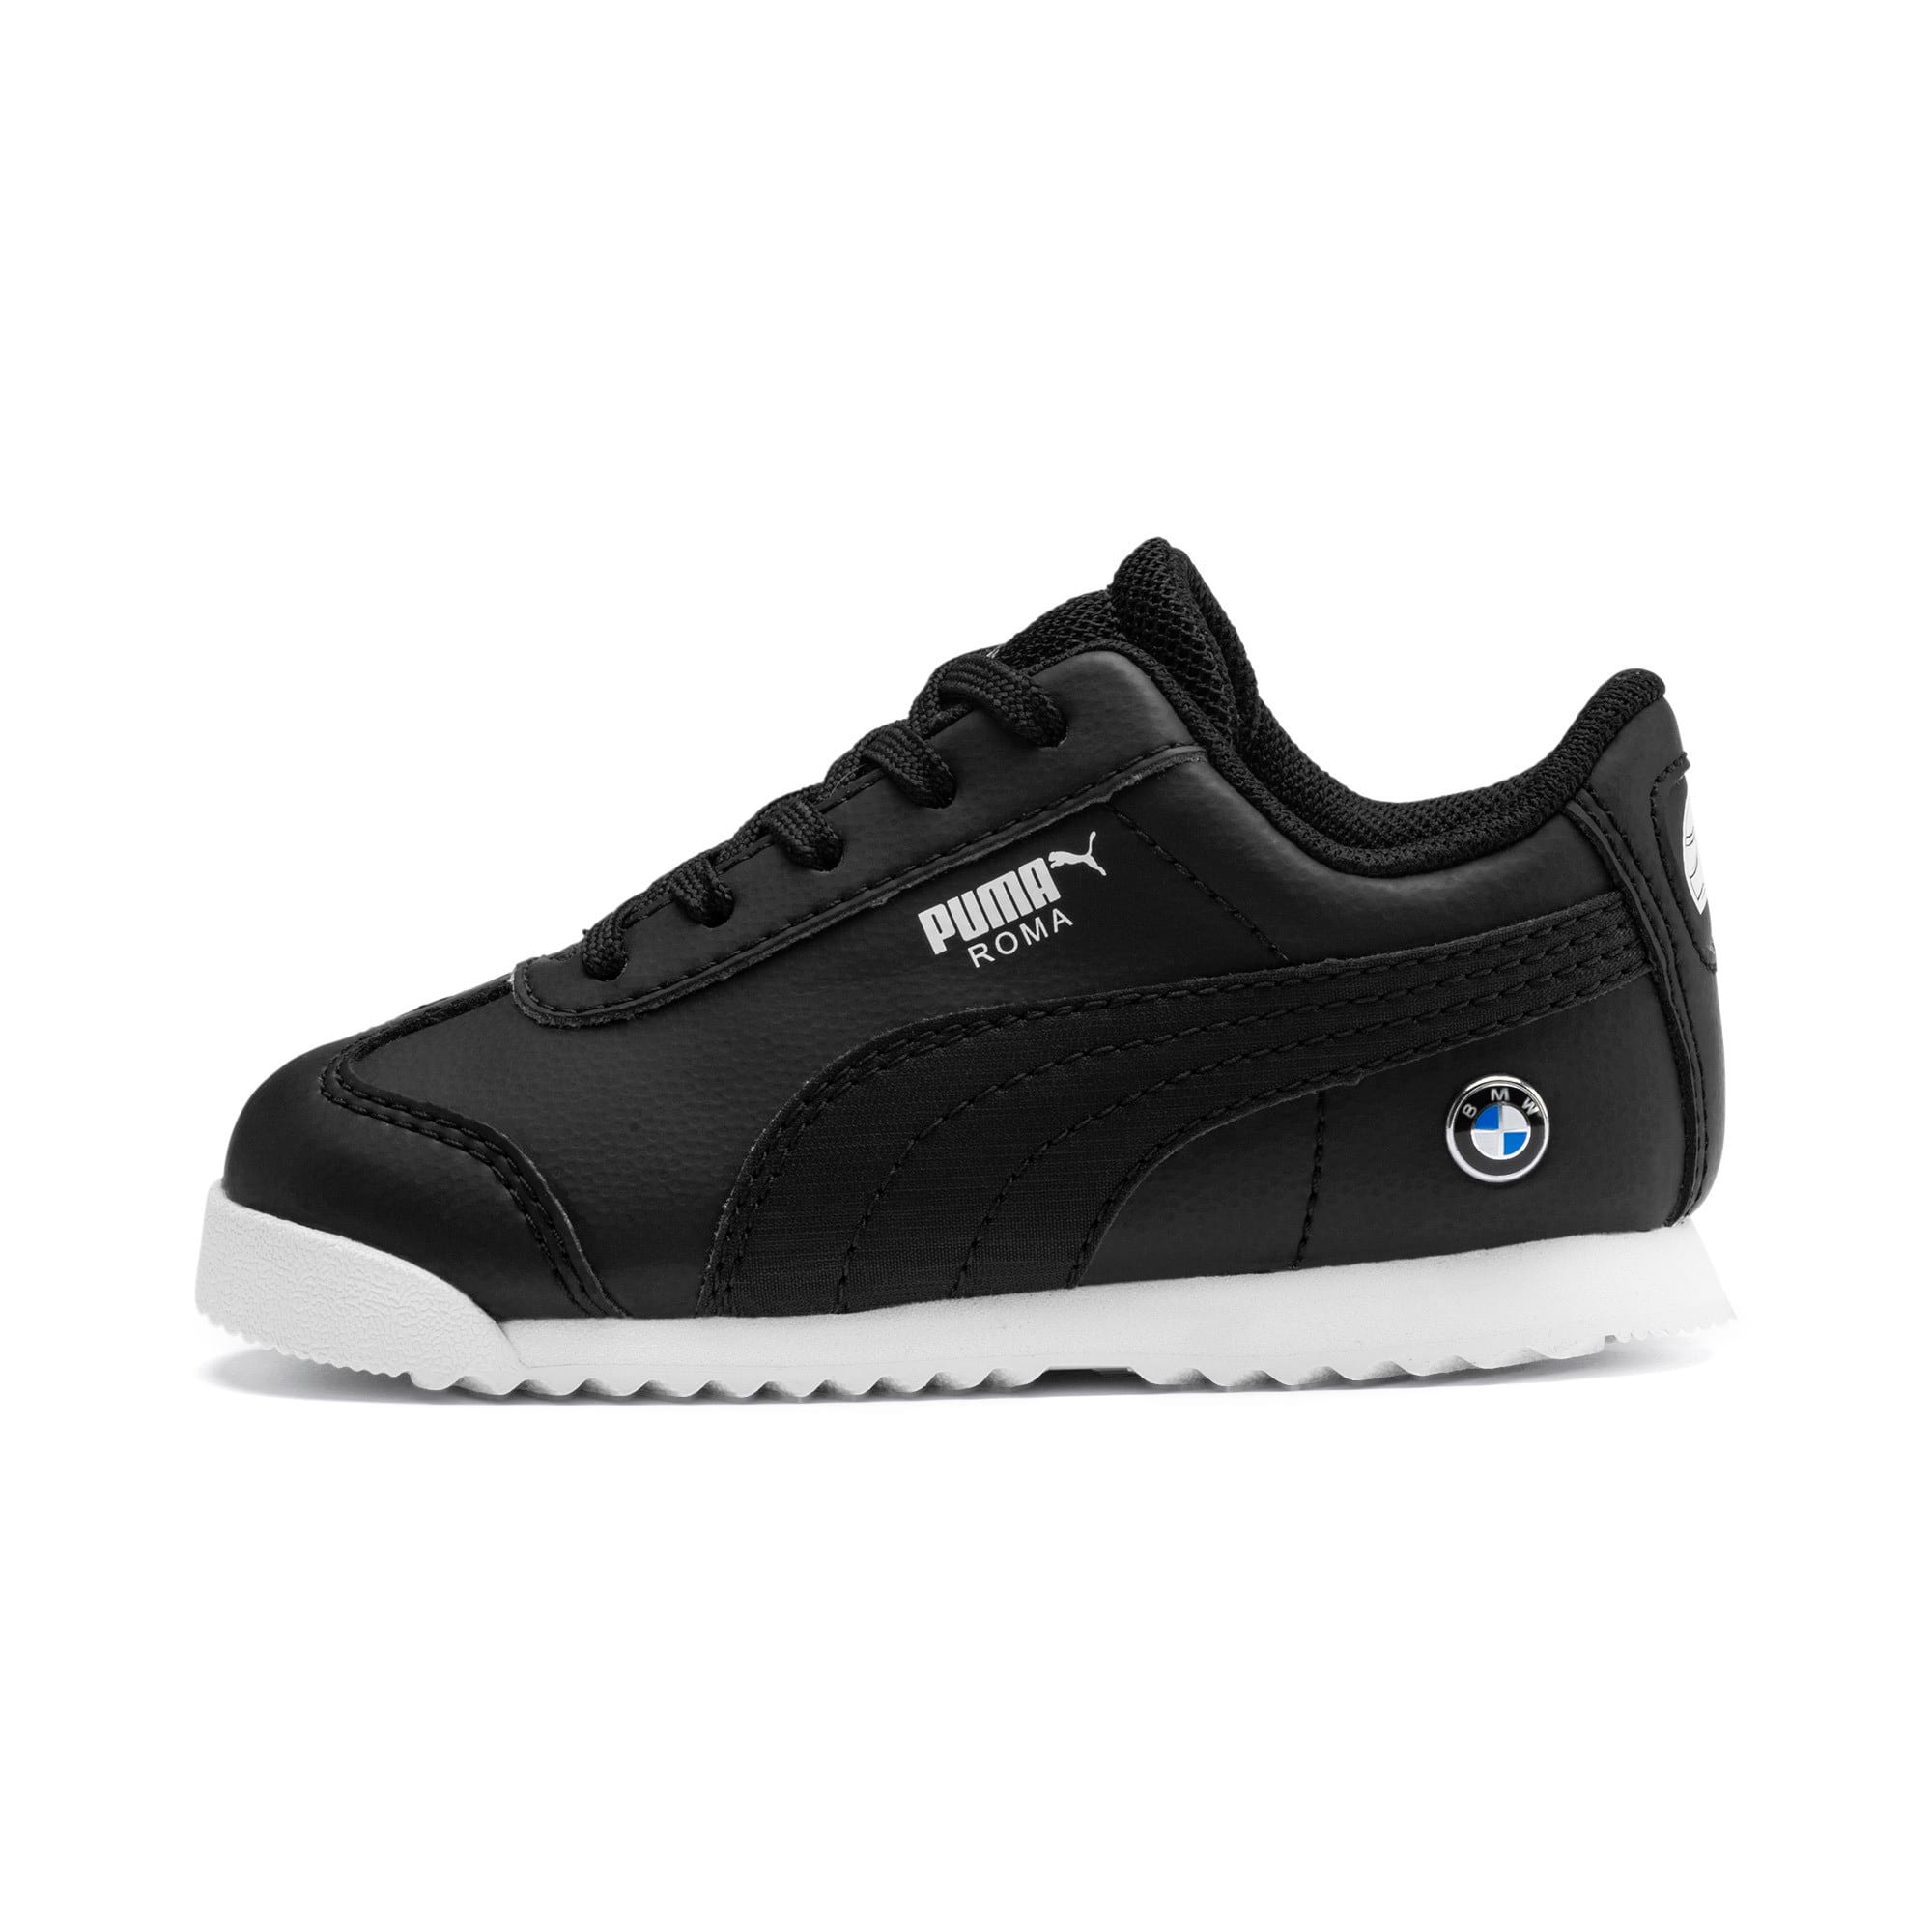 Thumbnail 1 of BMW M Motorsport Roma Toddler Shoes, Puma Black-Puma Black, medium